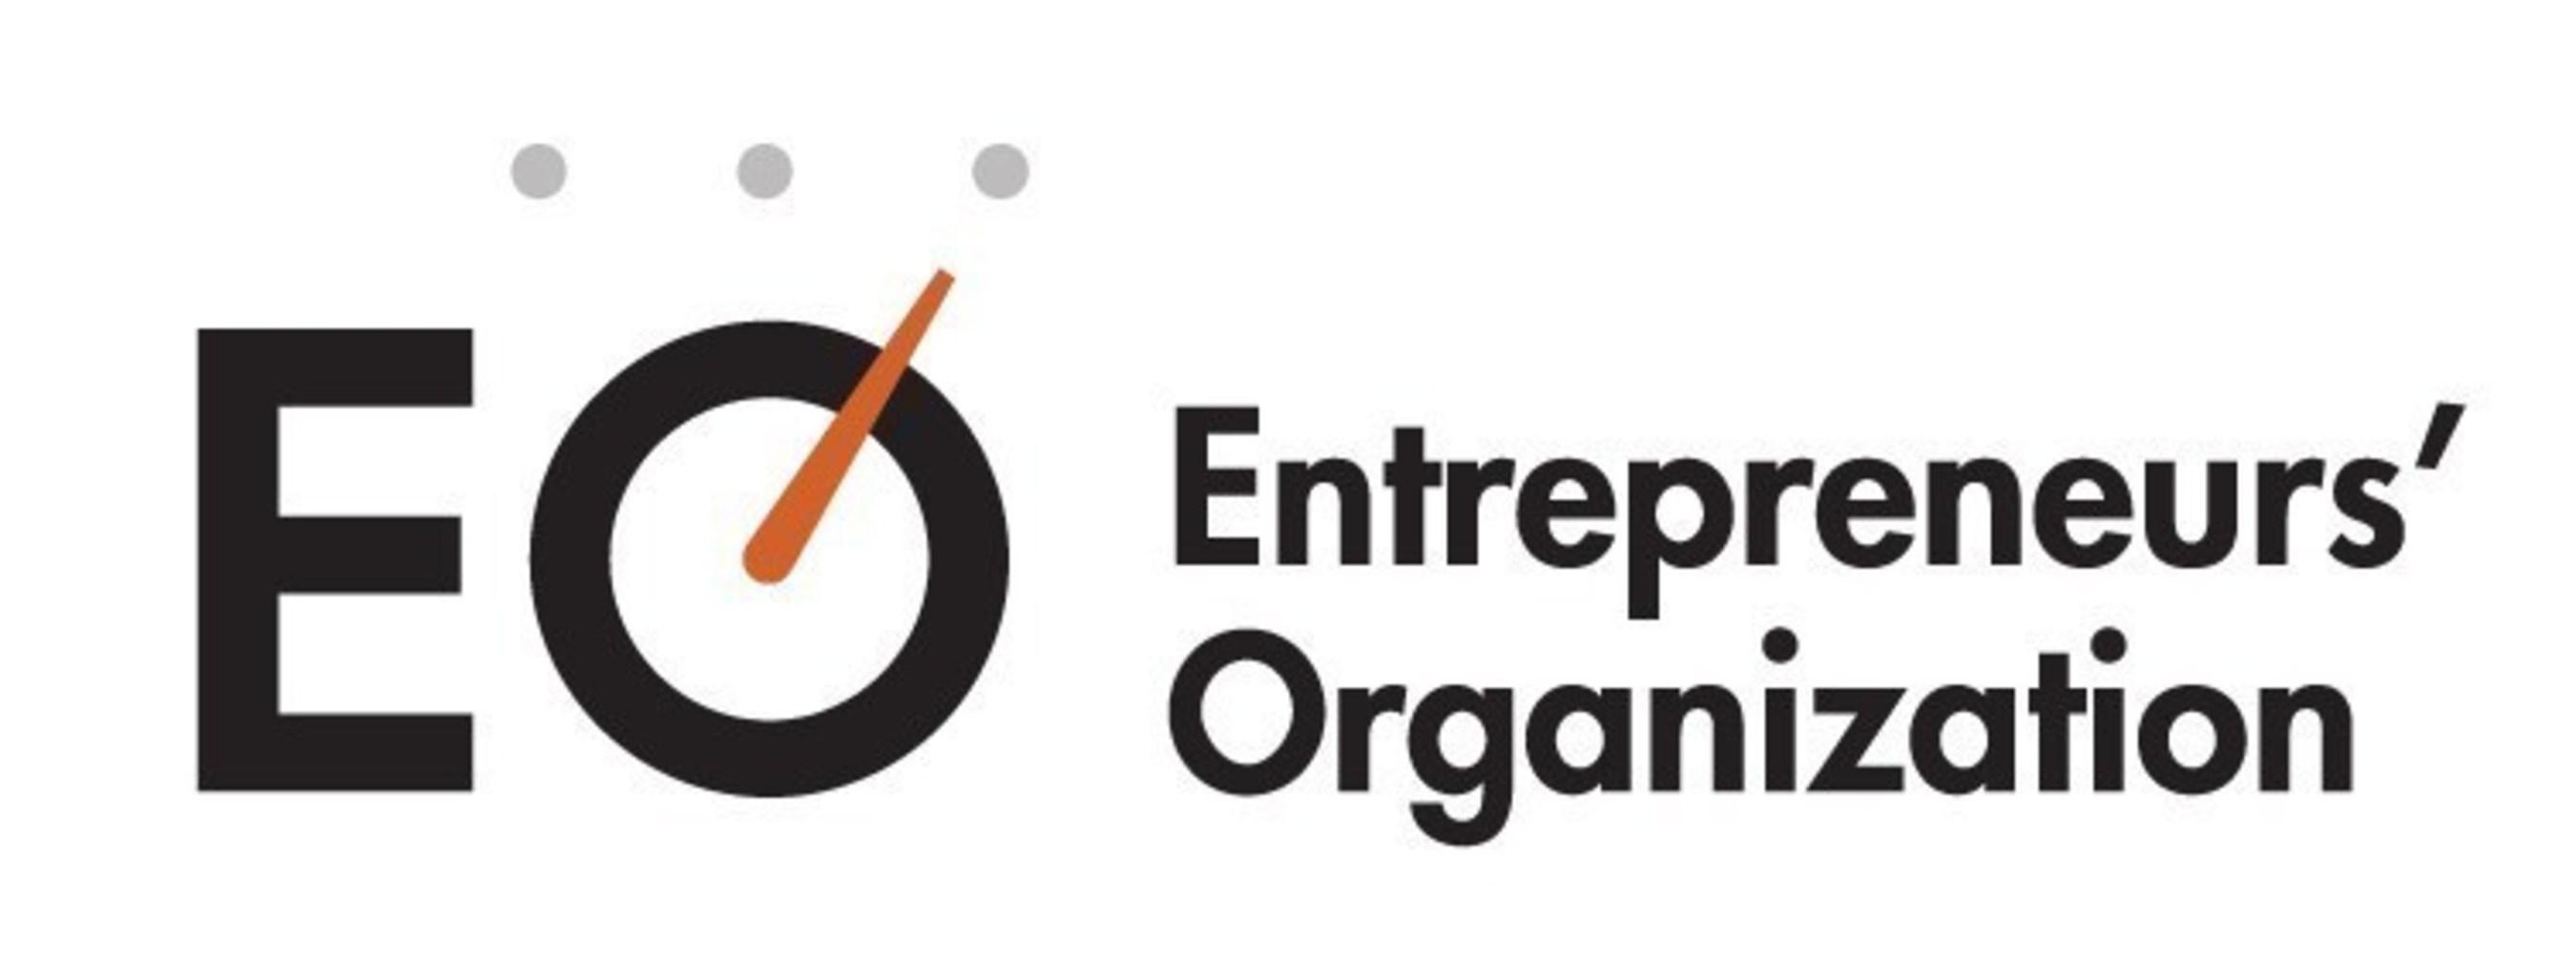 Entrepreneurs Organization - YouTube